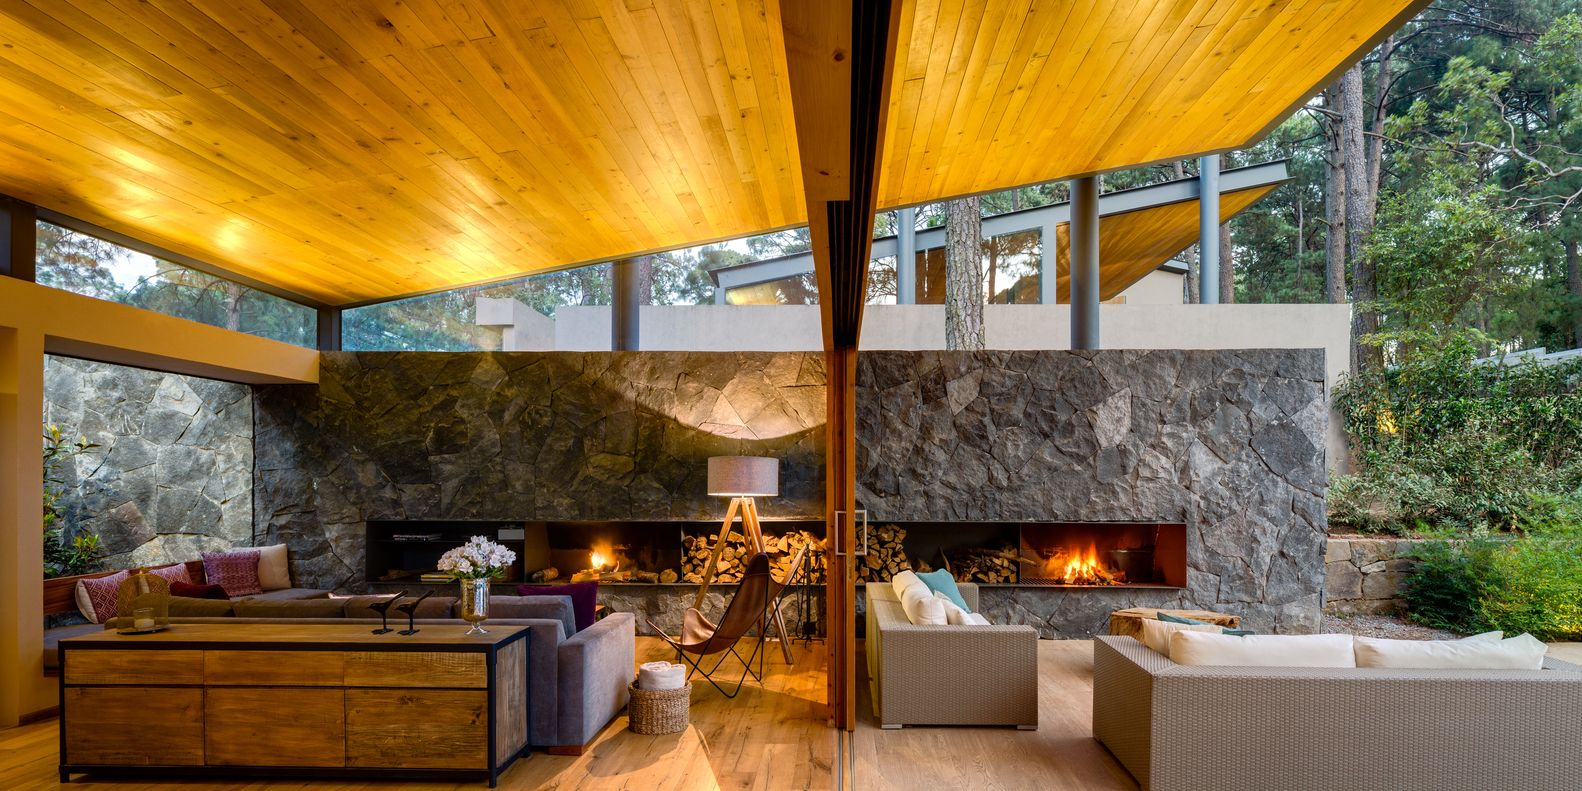 Galeria de Cinco Casas / Weber Arquitectos - 1